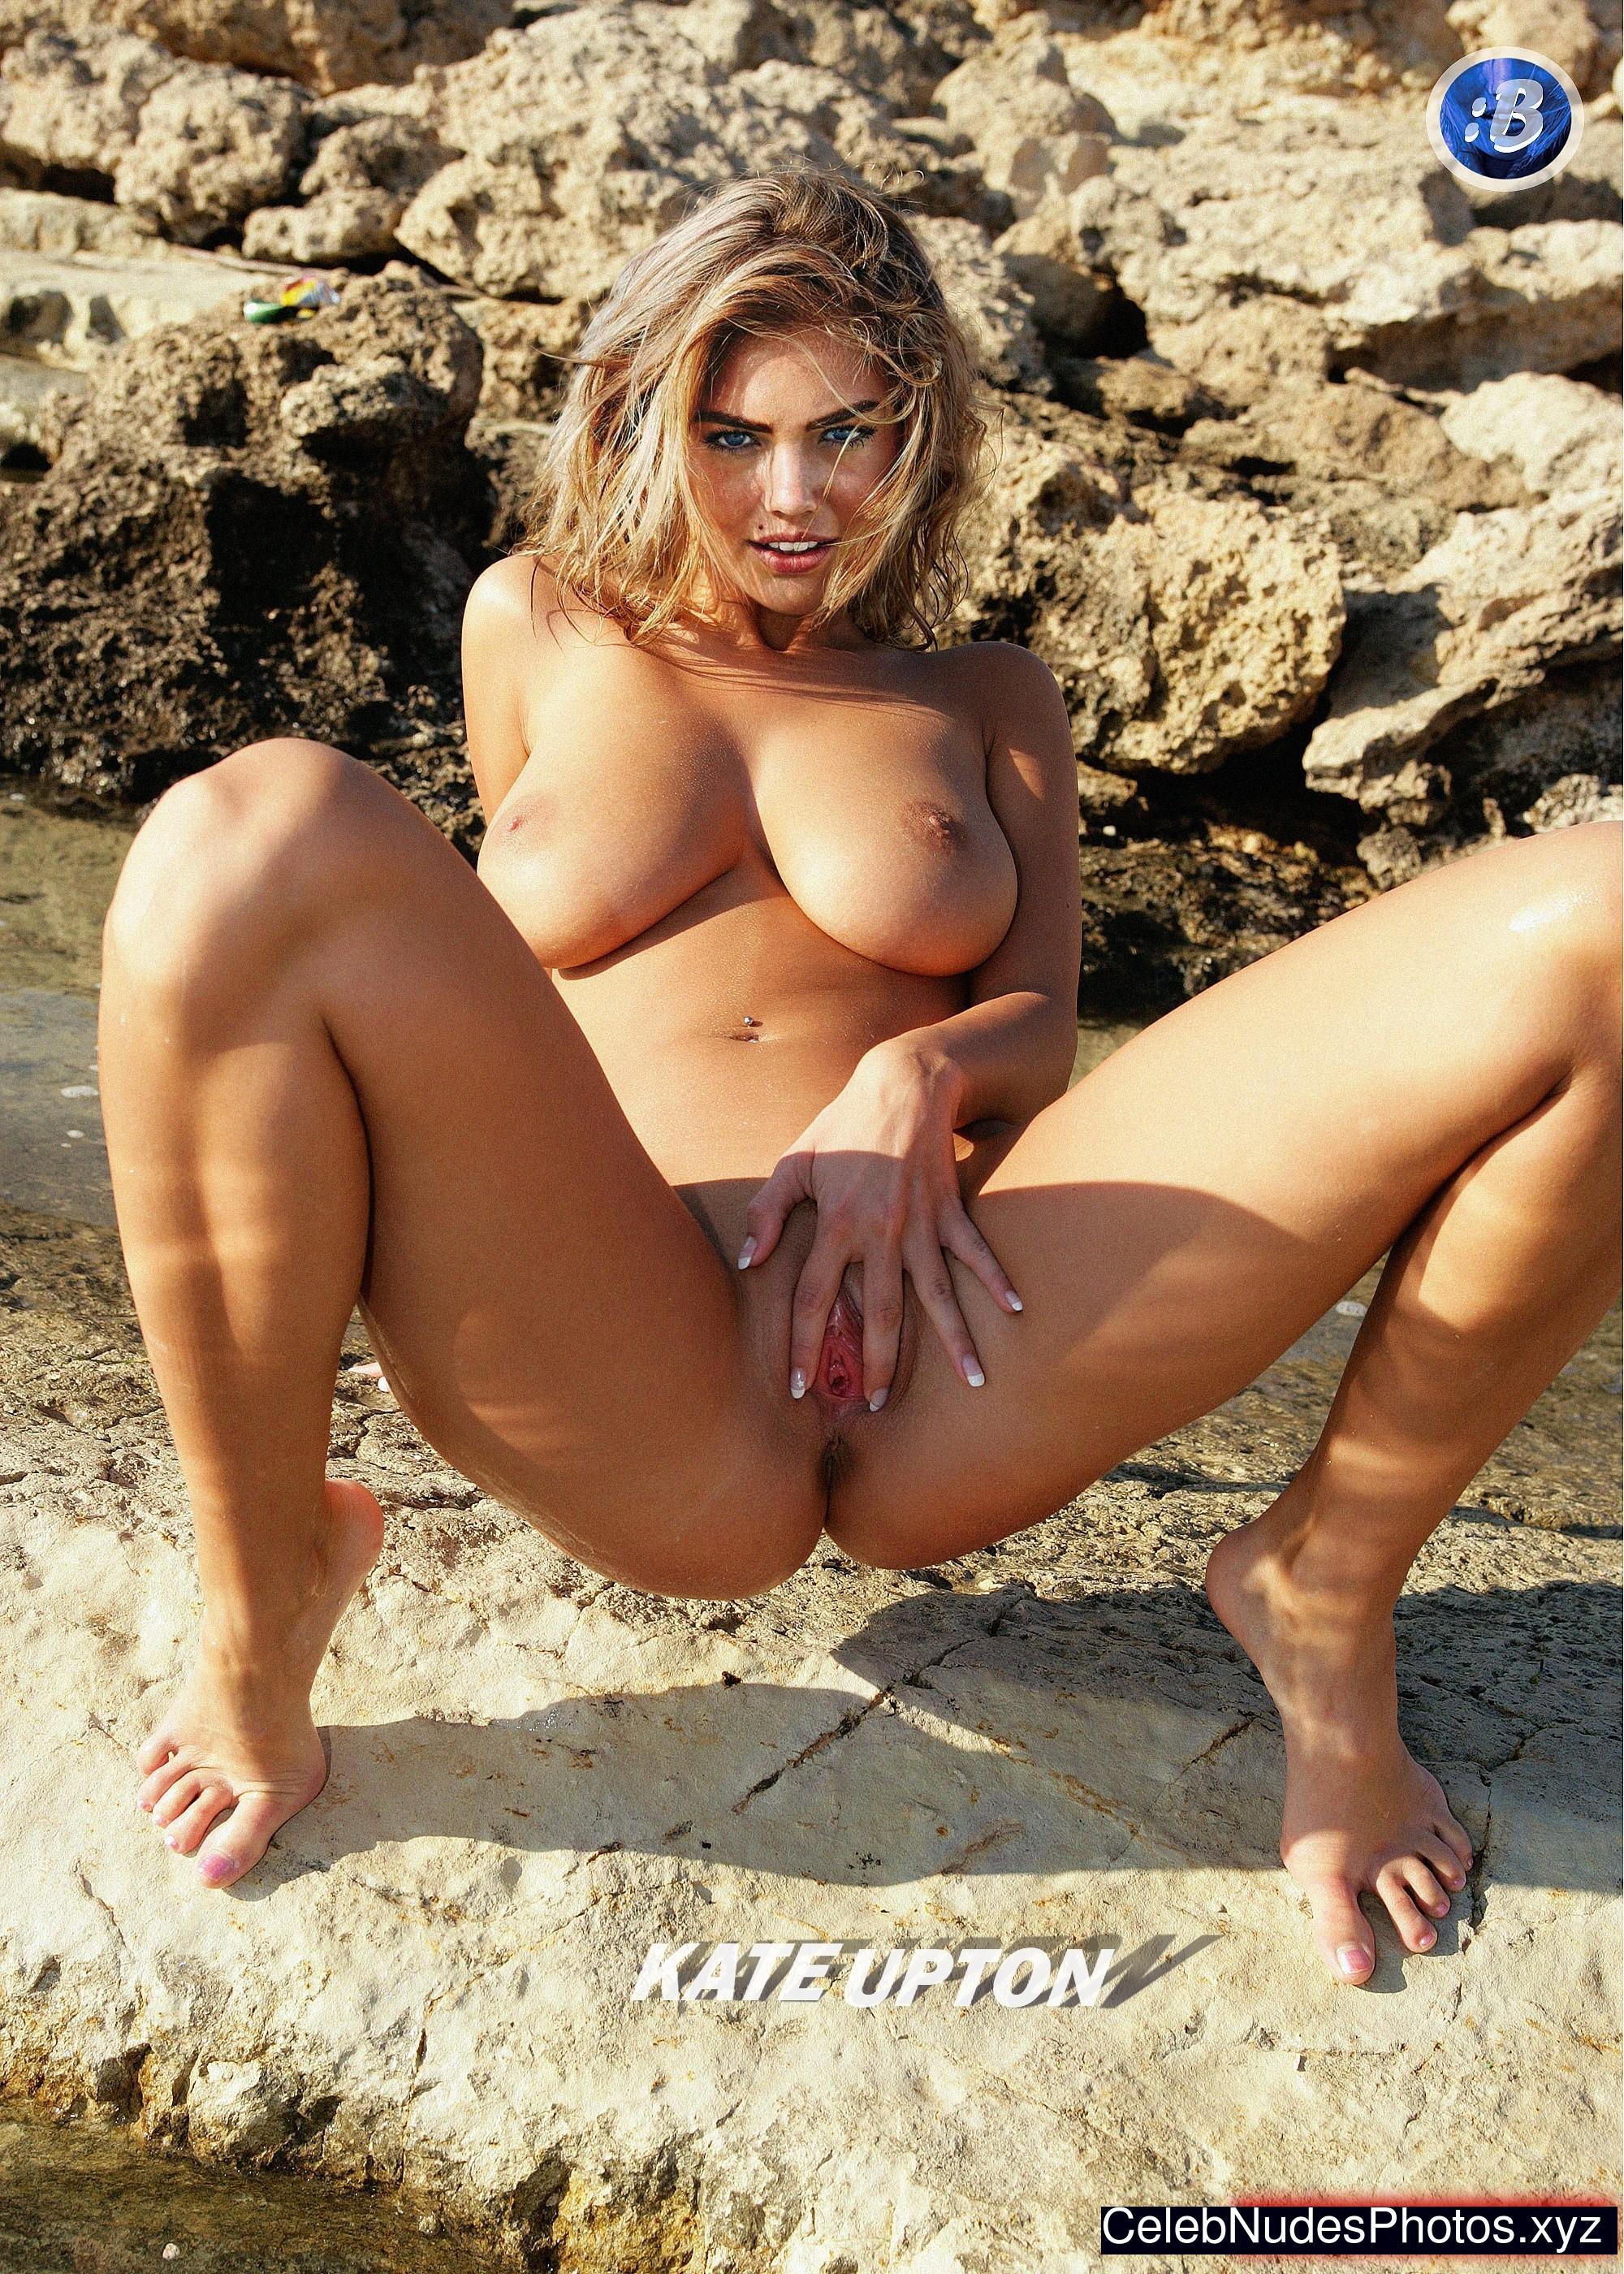 Nude pics of kate upton